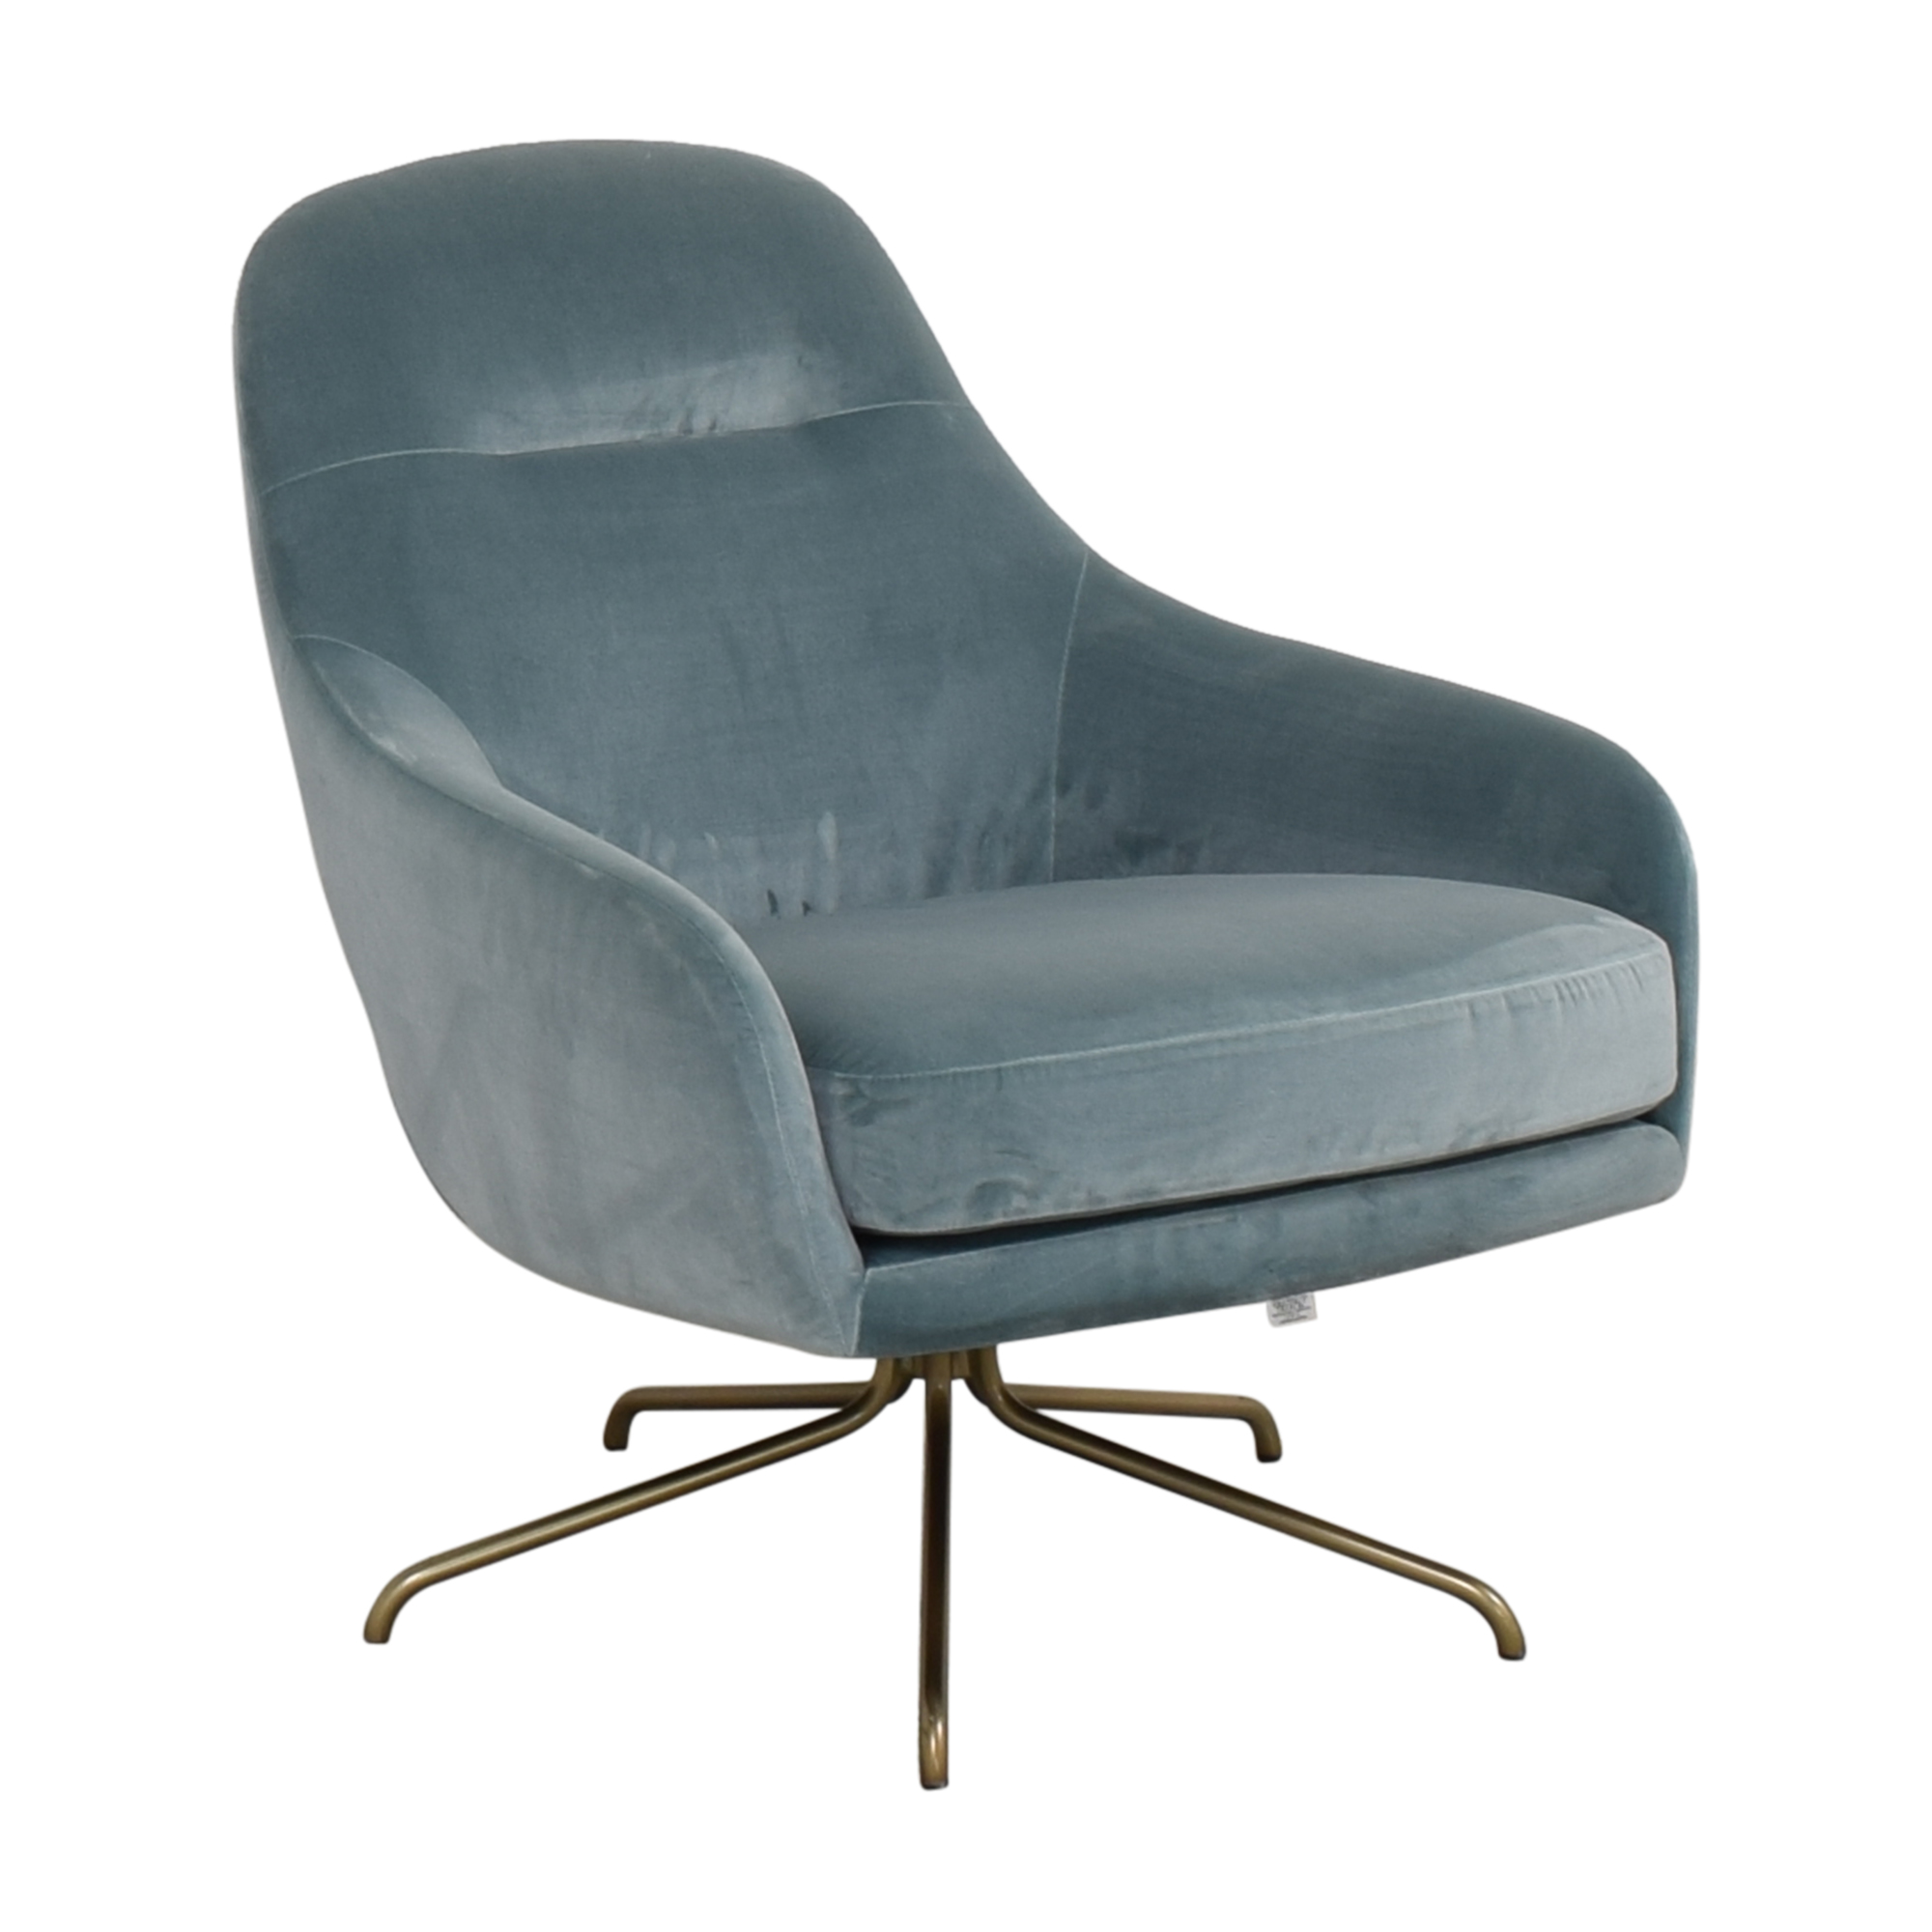 West Elm Valentina Swivel Chair sale